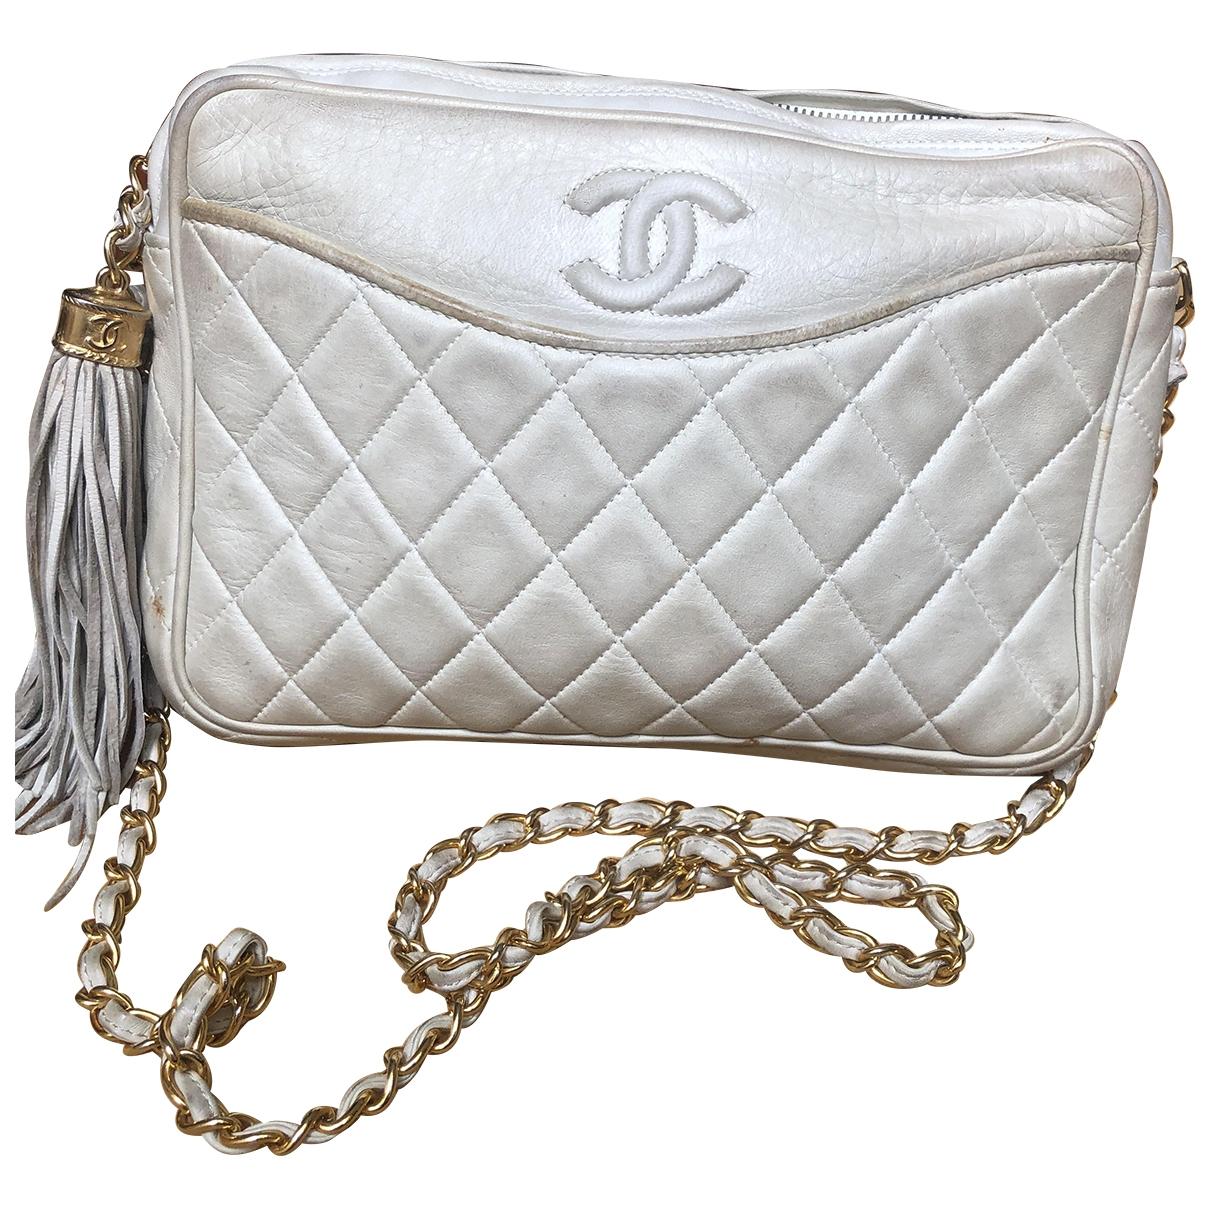 Chanel Camera Handtasche in  Ecru Leder